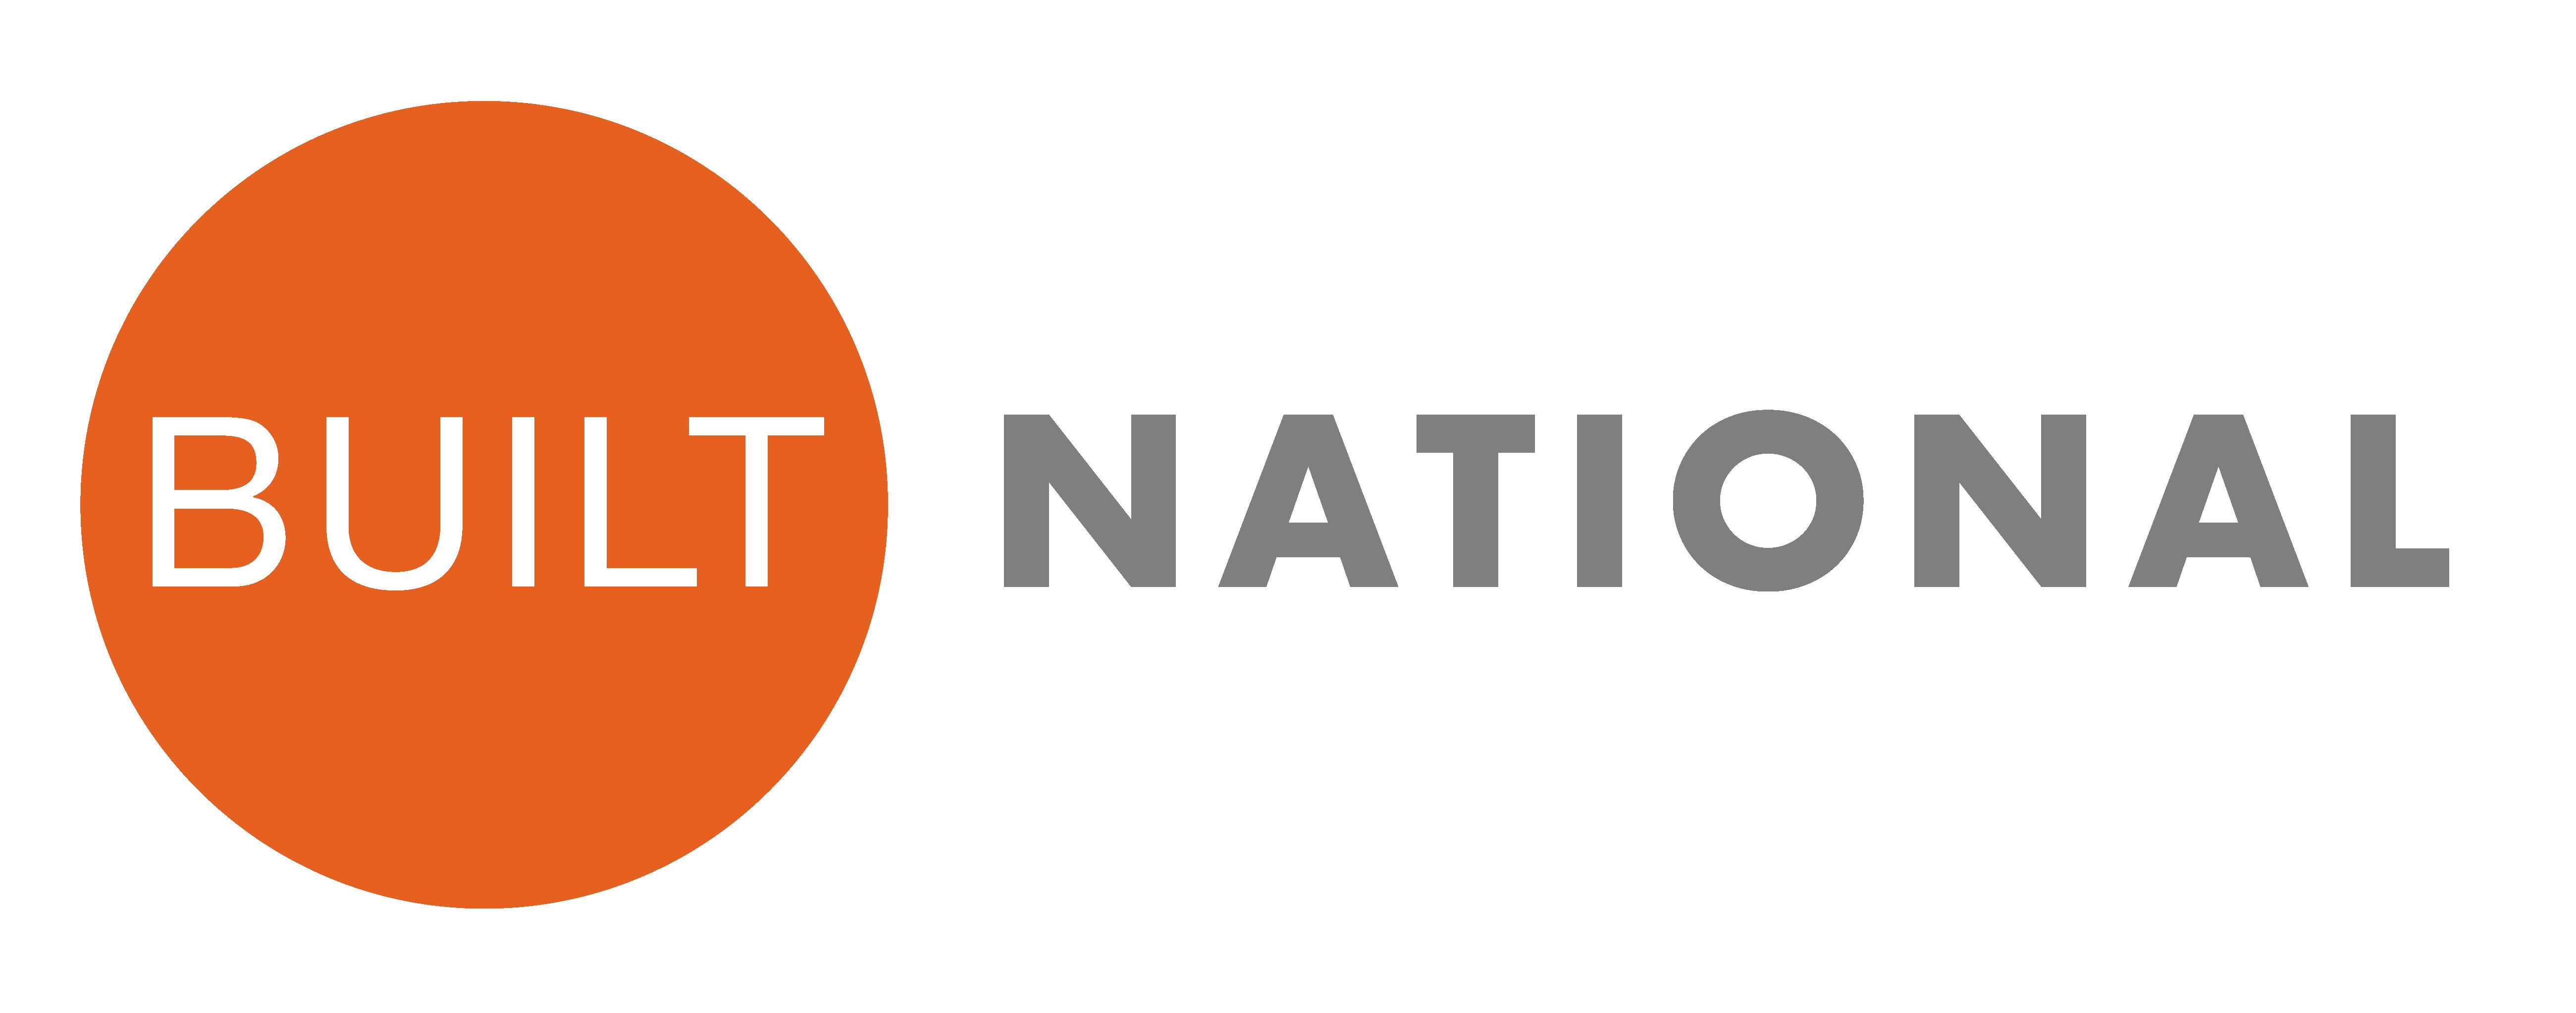 Built National Conference's Logo